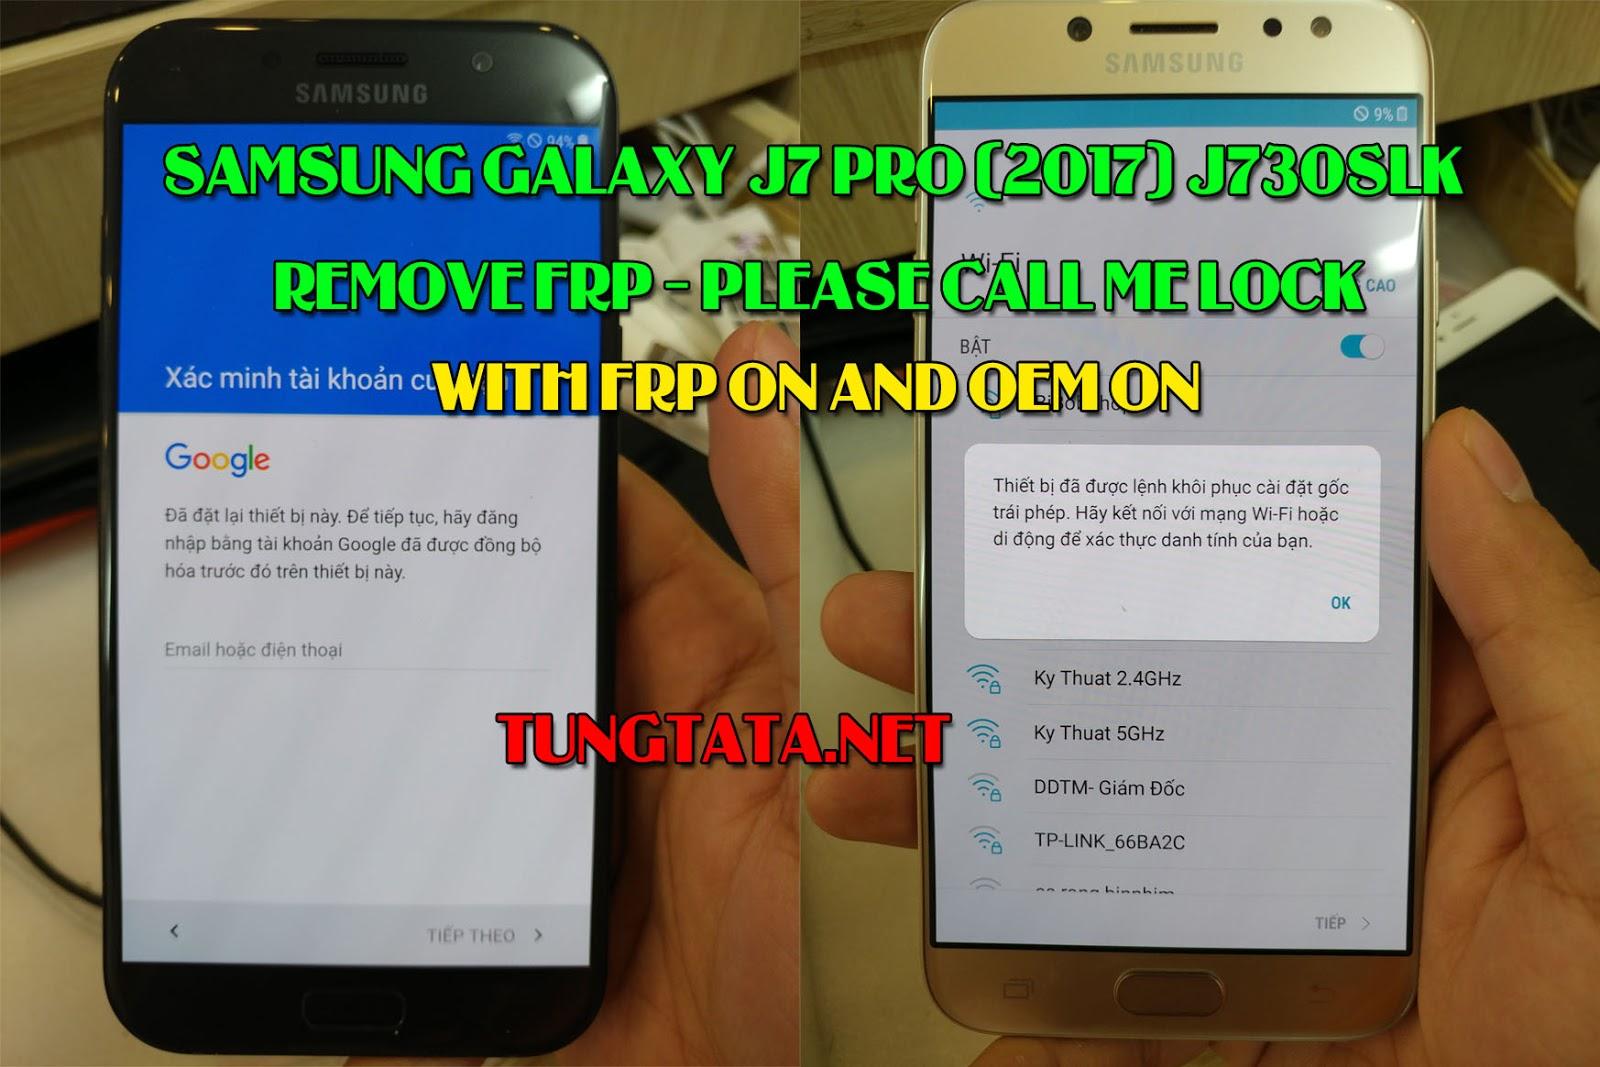 Samsung J7 PRO 2017 SM-J730S SM-J730L SM-J730K remove FRP lock, Please Call Me lock